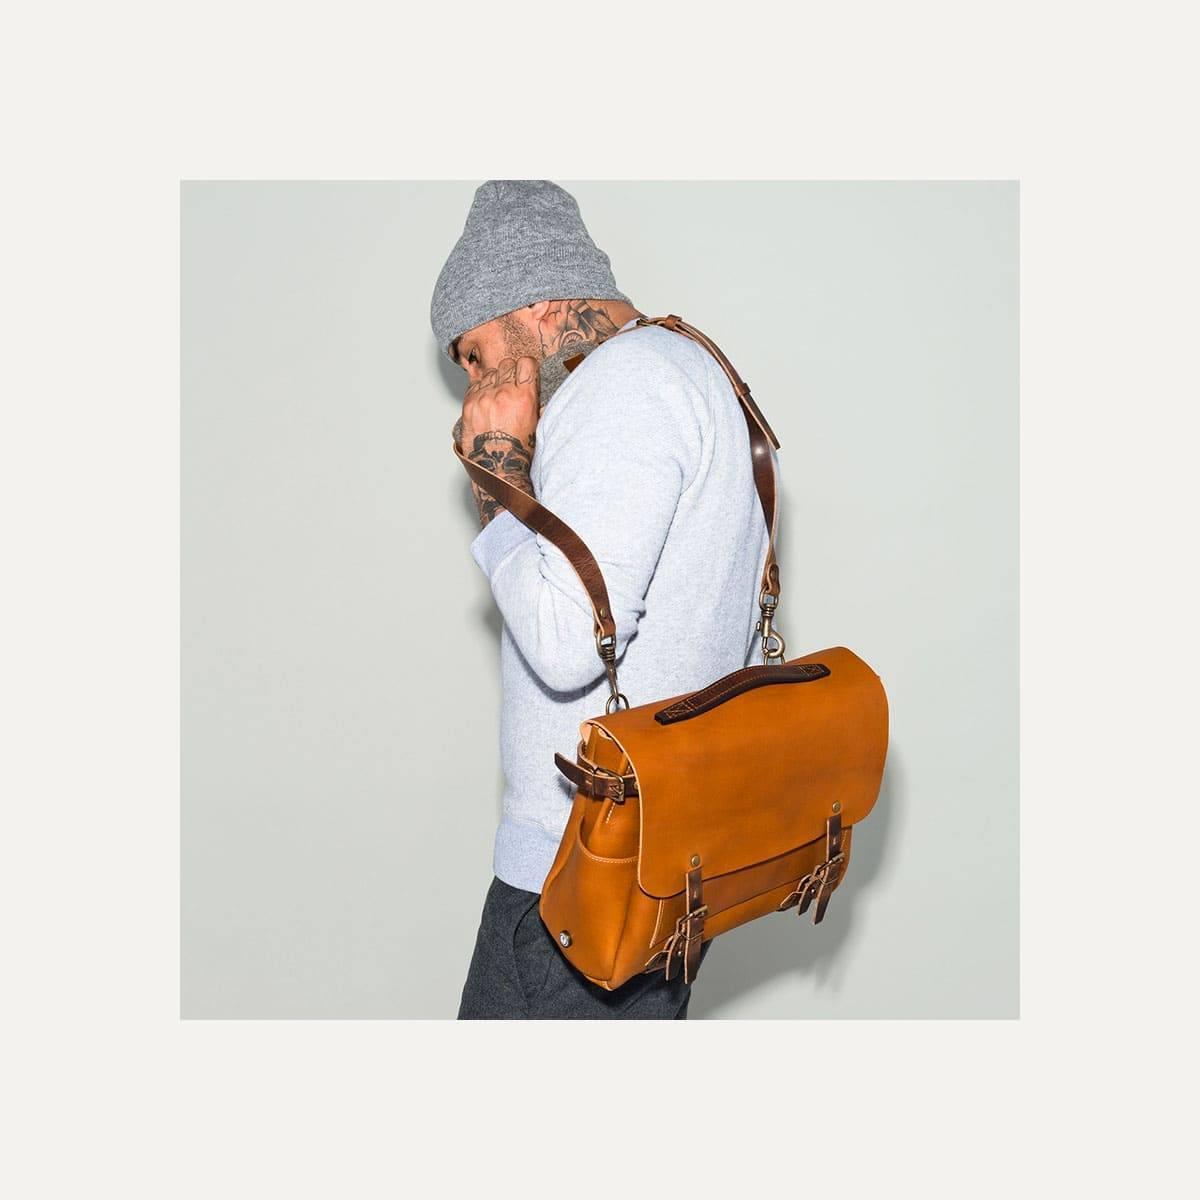 Postman bag Eclair M - Pain brulé  (image n°9)